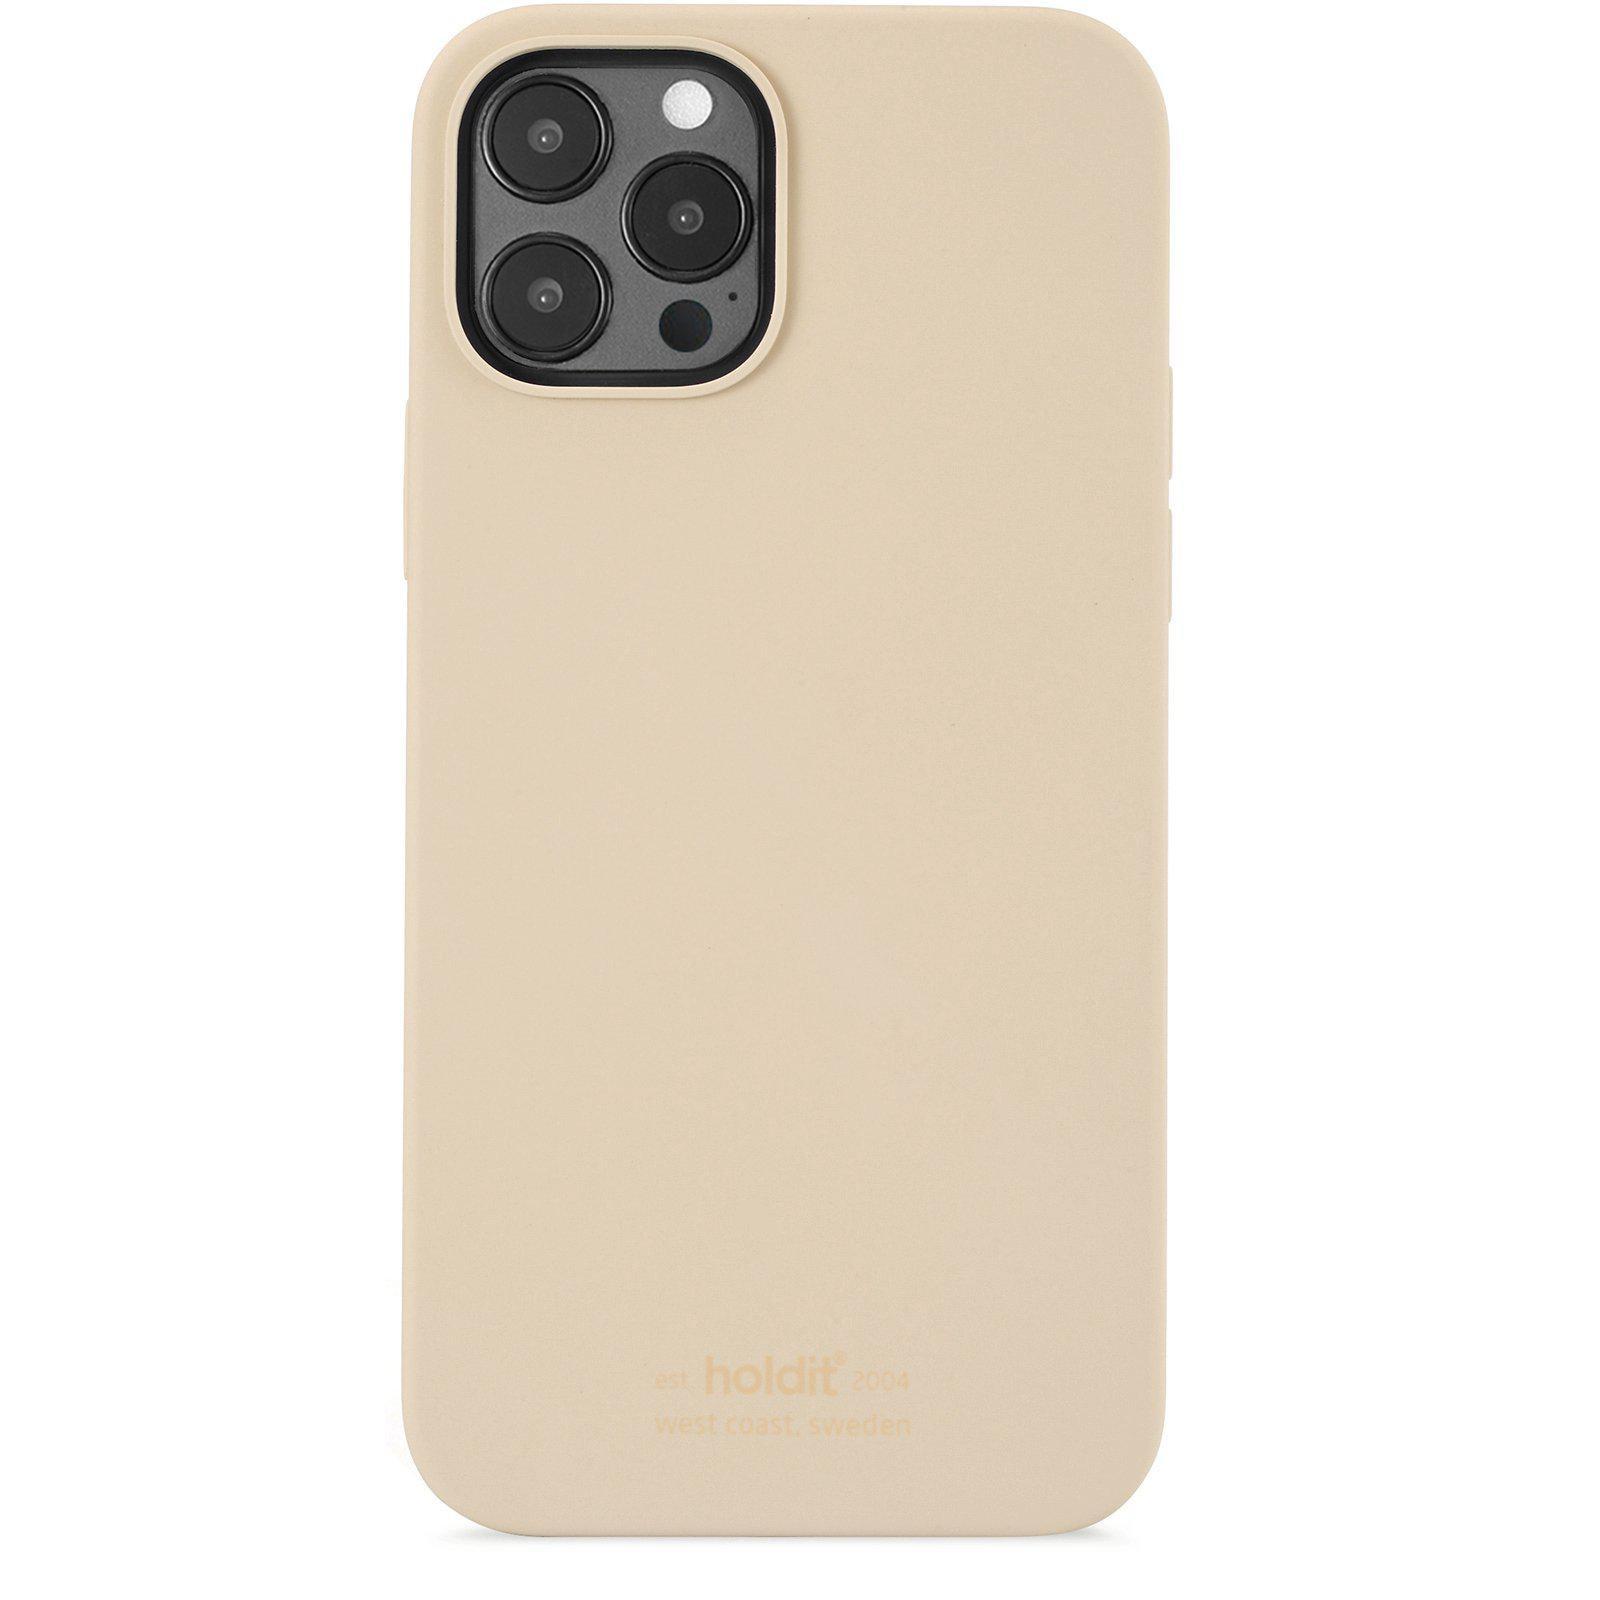 Silikonskal iPhone 12/12 Pro Beige